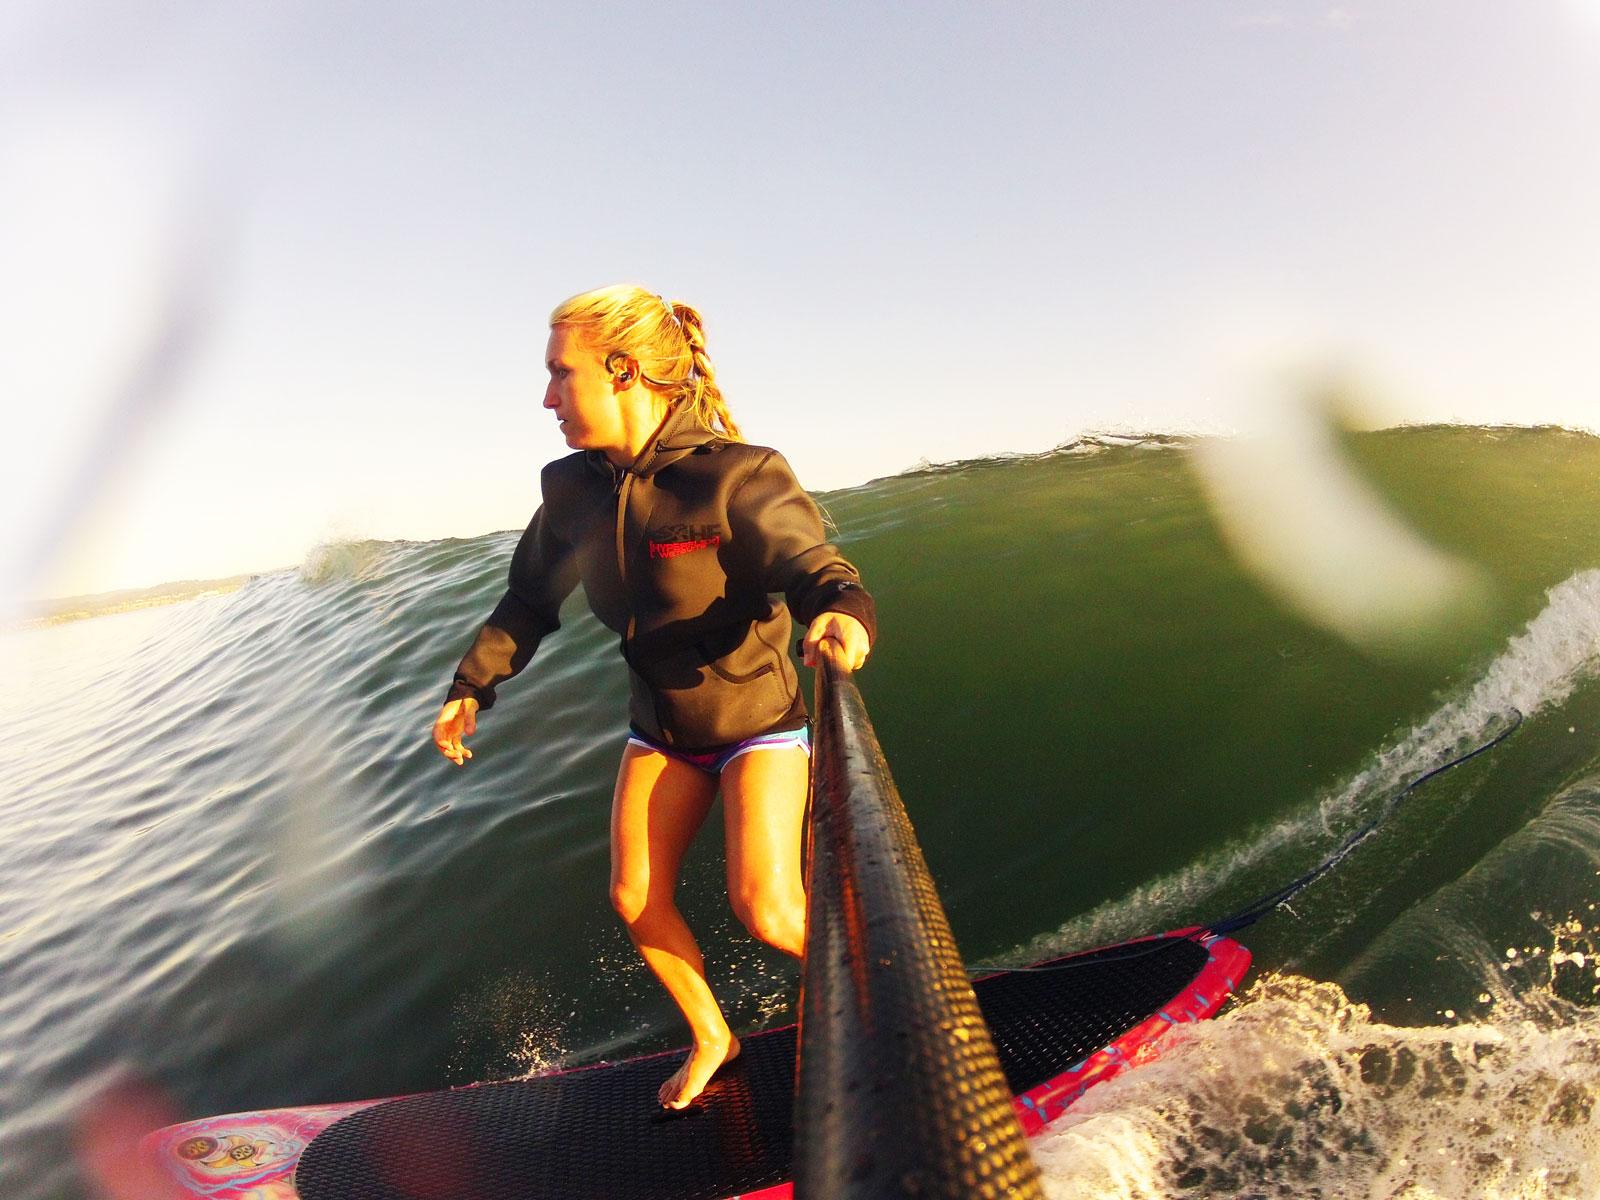 SUP surfing Privates, Capitola.